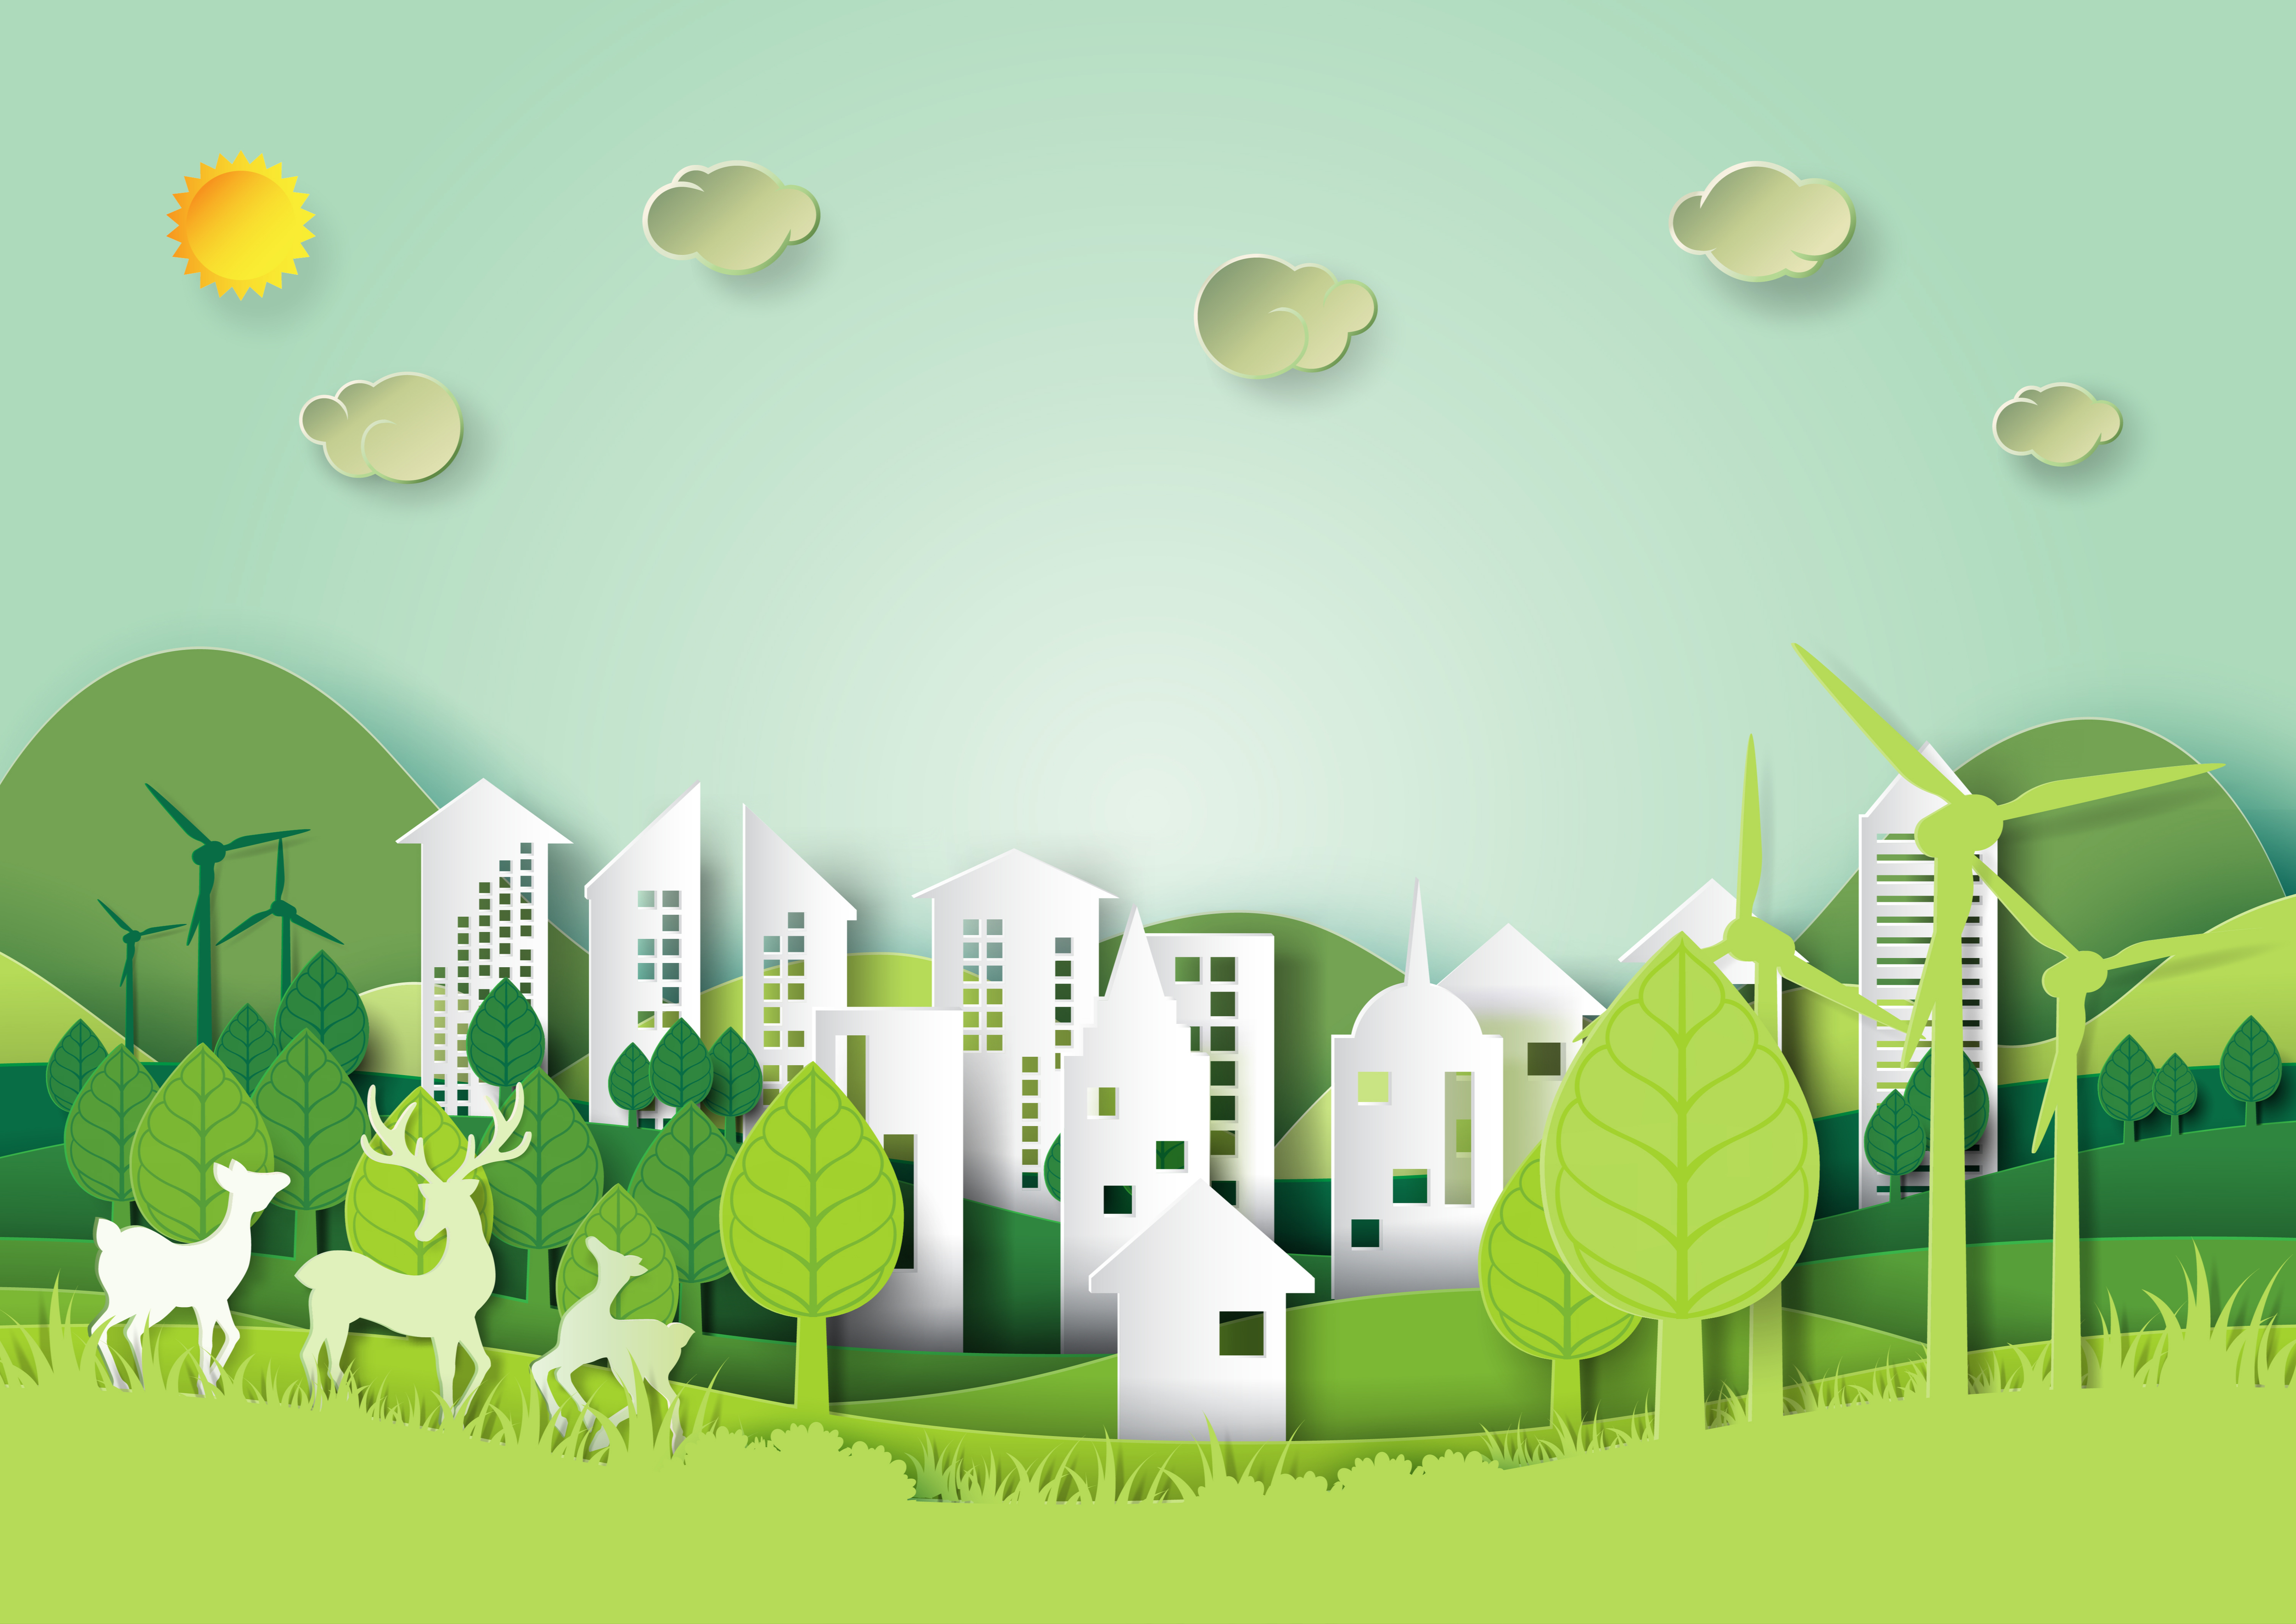 [MÀJ] Microsoft Advertising : Avec Get to Green, Yumens contribue à la protection de l'environnement